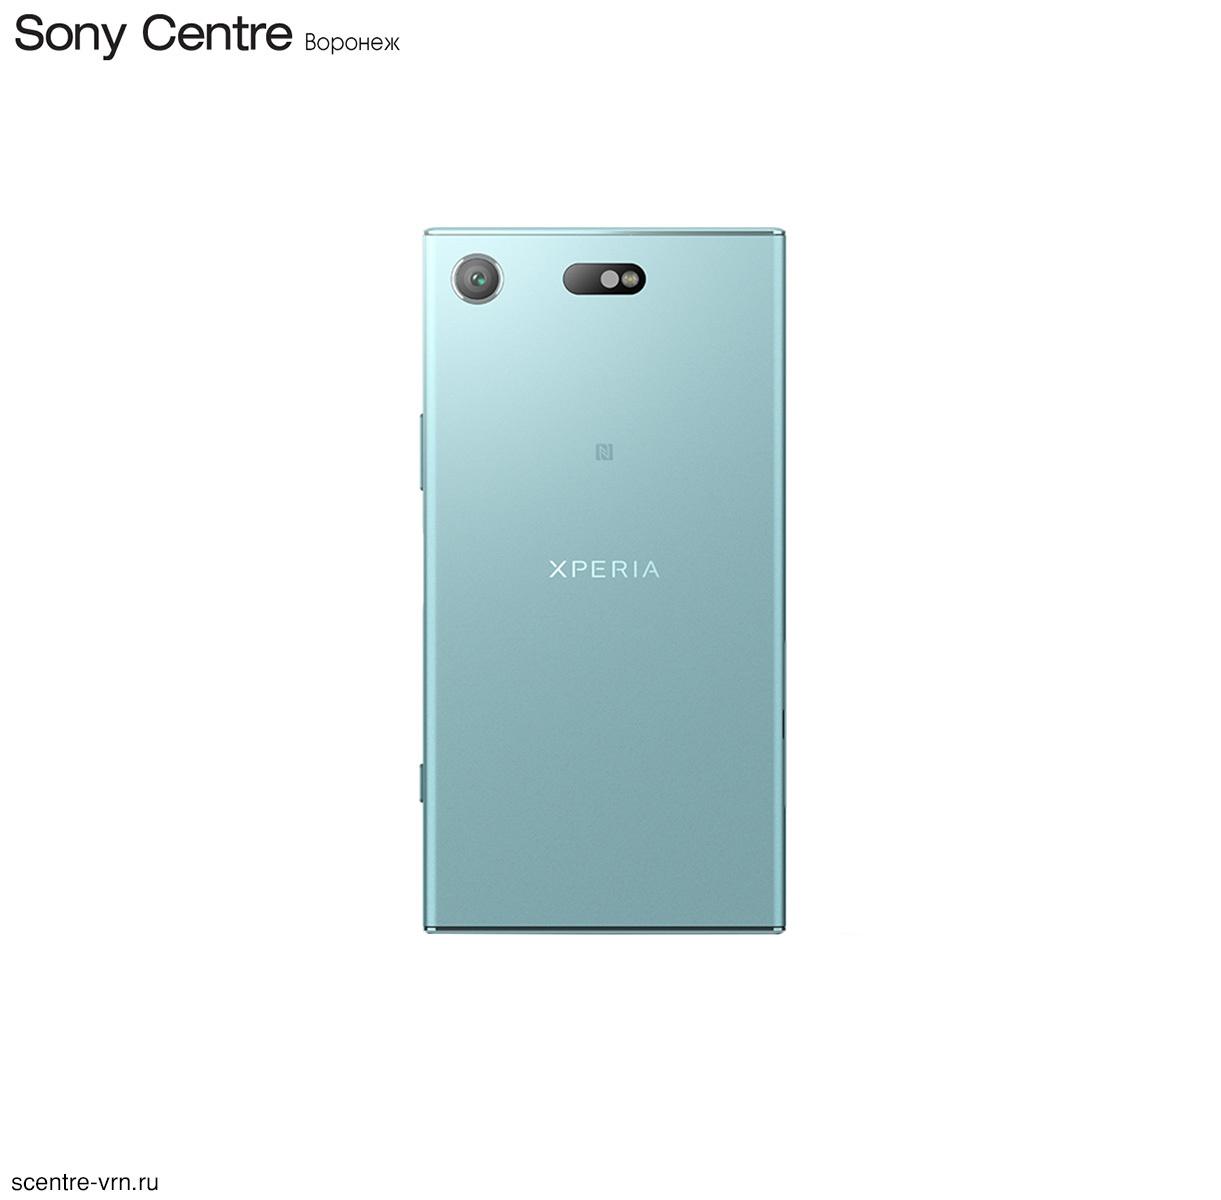 G8441/L смартфон Sony Xperia XZ1 Compact, цвет Сумеречно-голубой